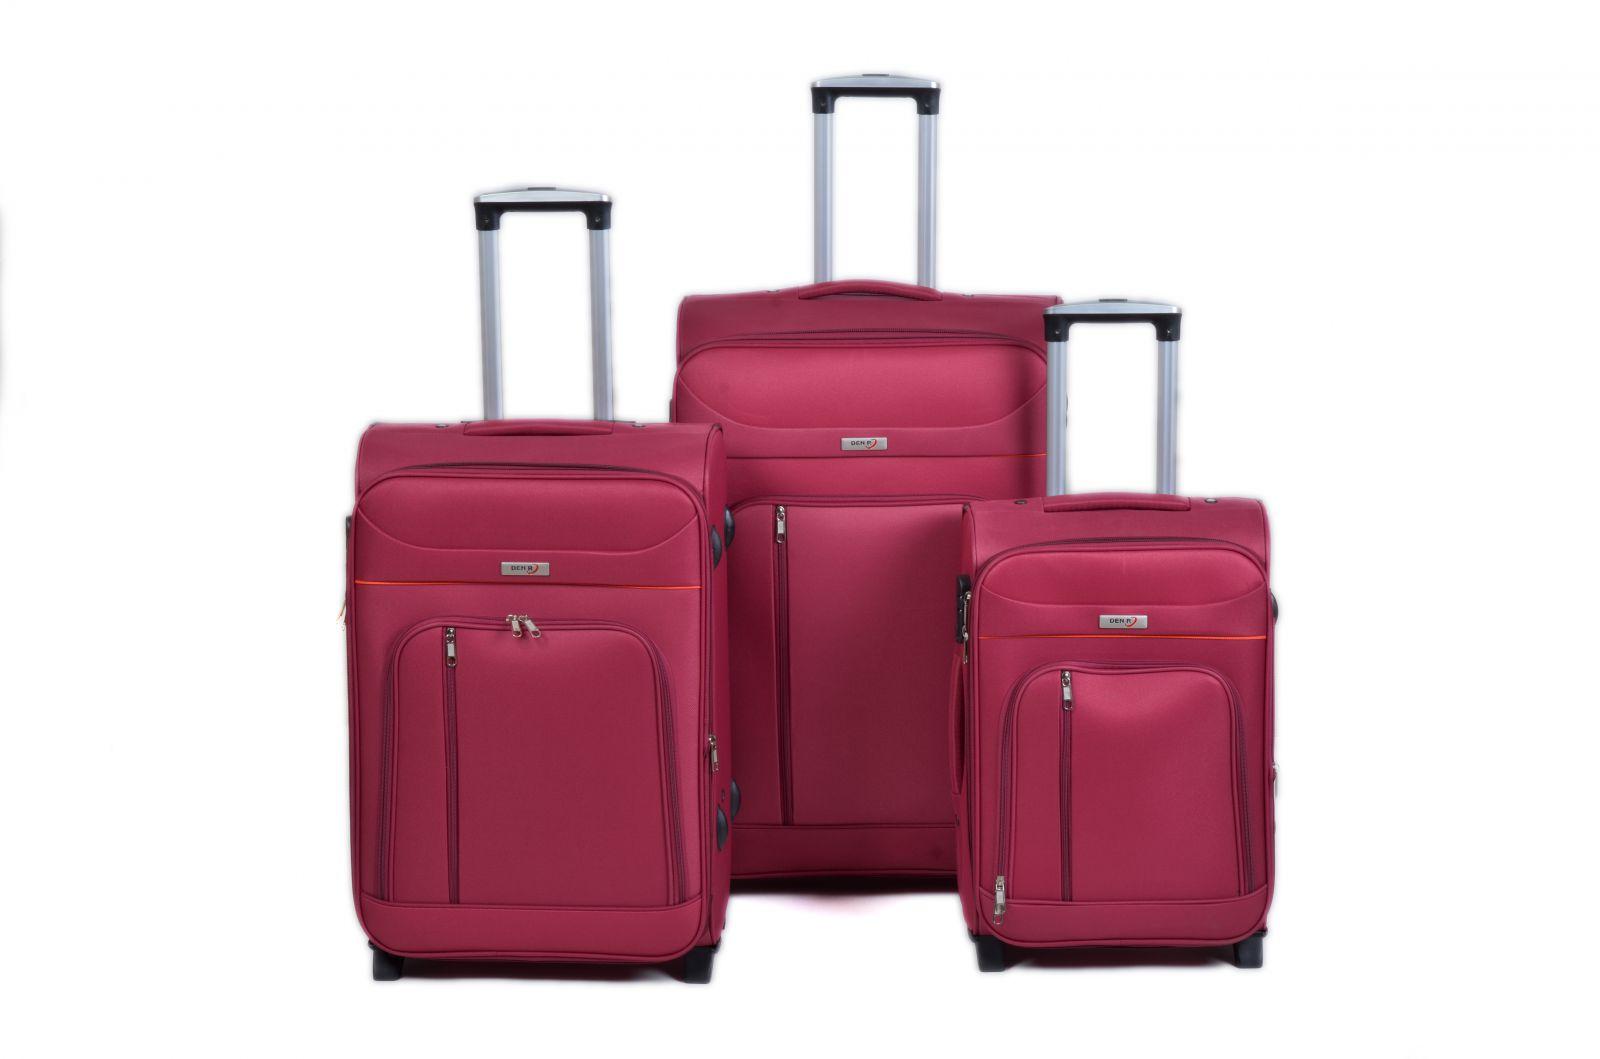 Trolley-CASE TC-B887 sada 3 kufru červená